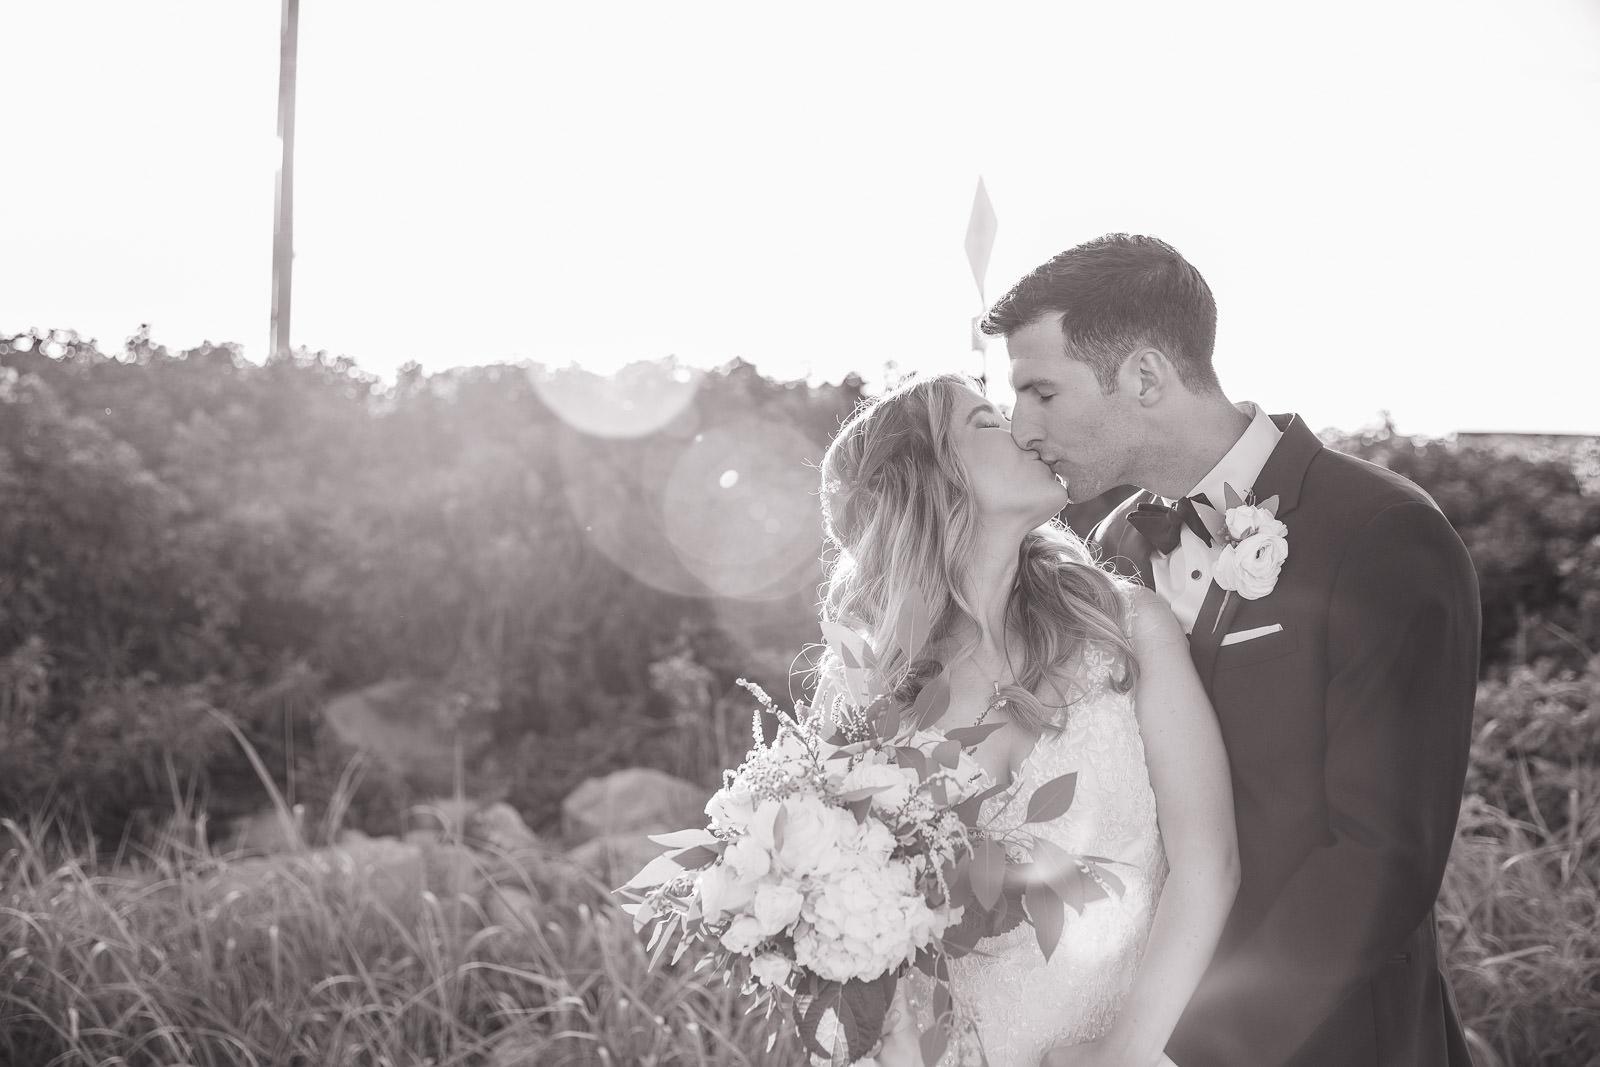 Wedding, Narragansett Towers, The Towers, Narragansett, Rhode Island, RI, Tracy Jenkins photography, RI wedding photographer, Rhode Island wedding photographer, bride, groom, sunset photos, couple photos